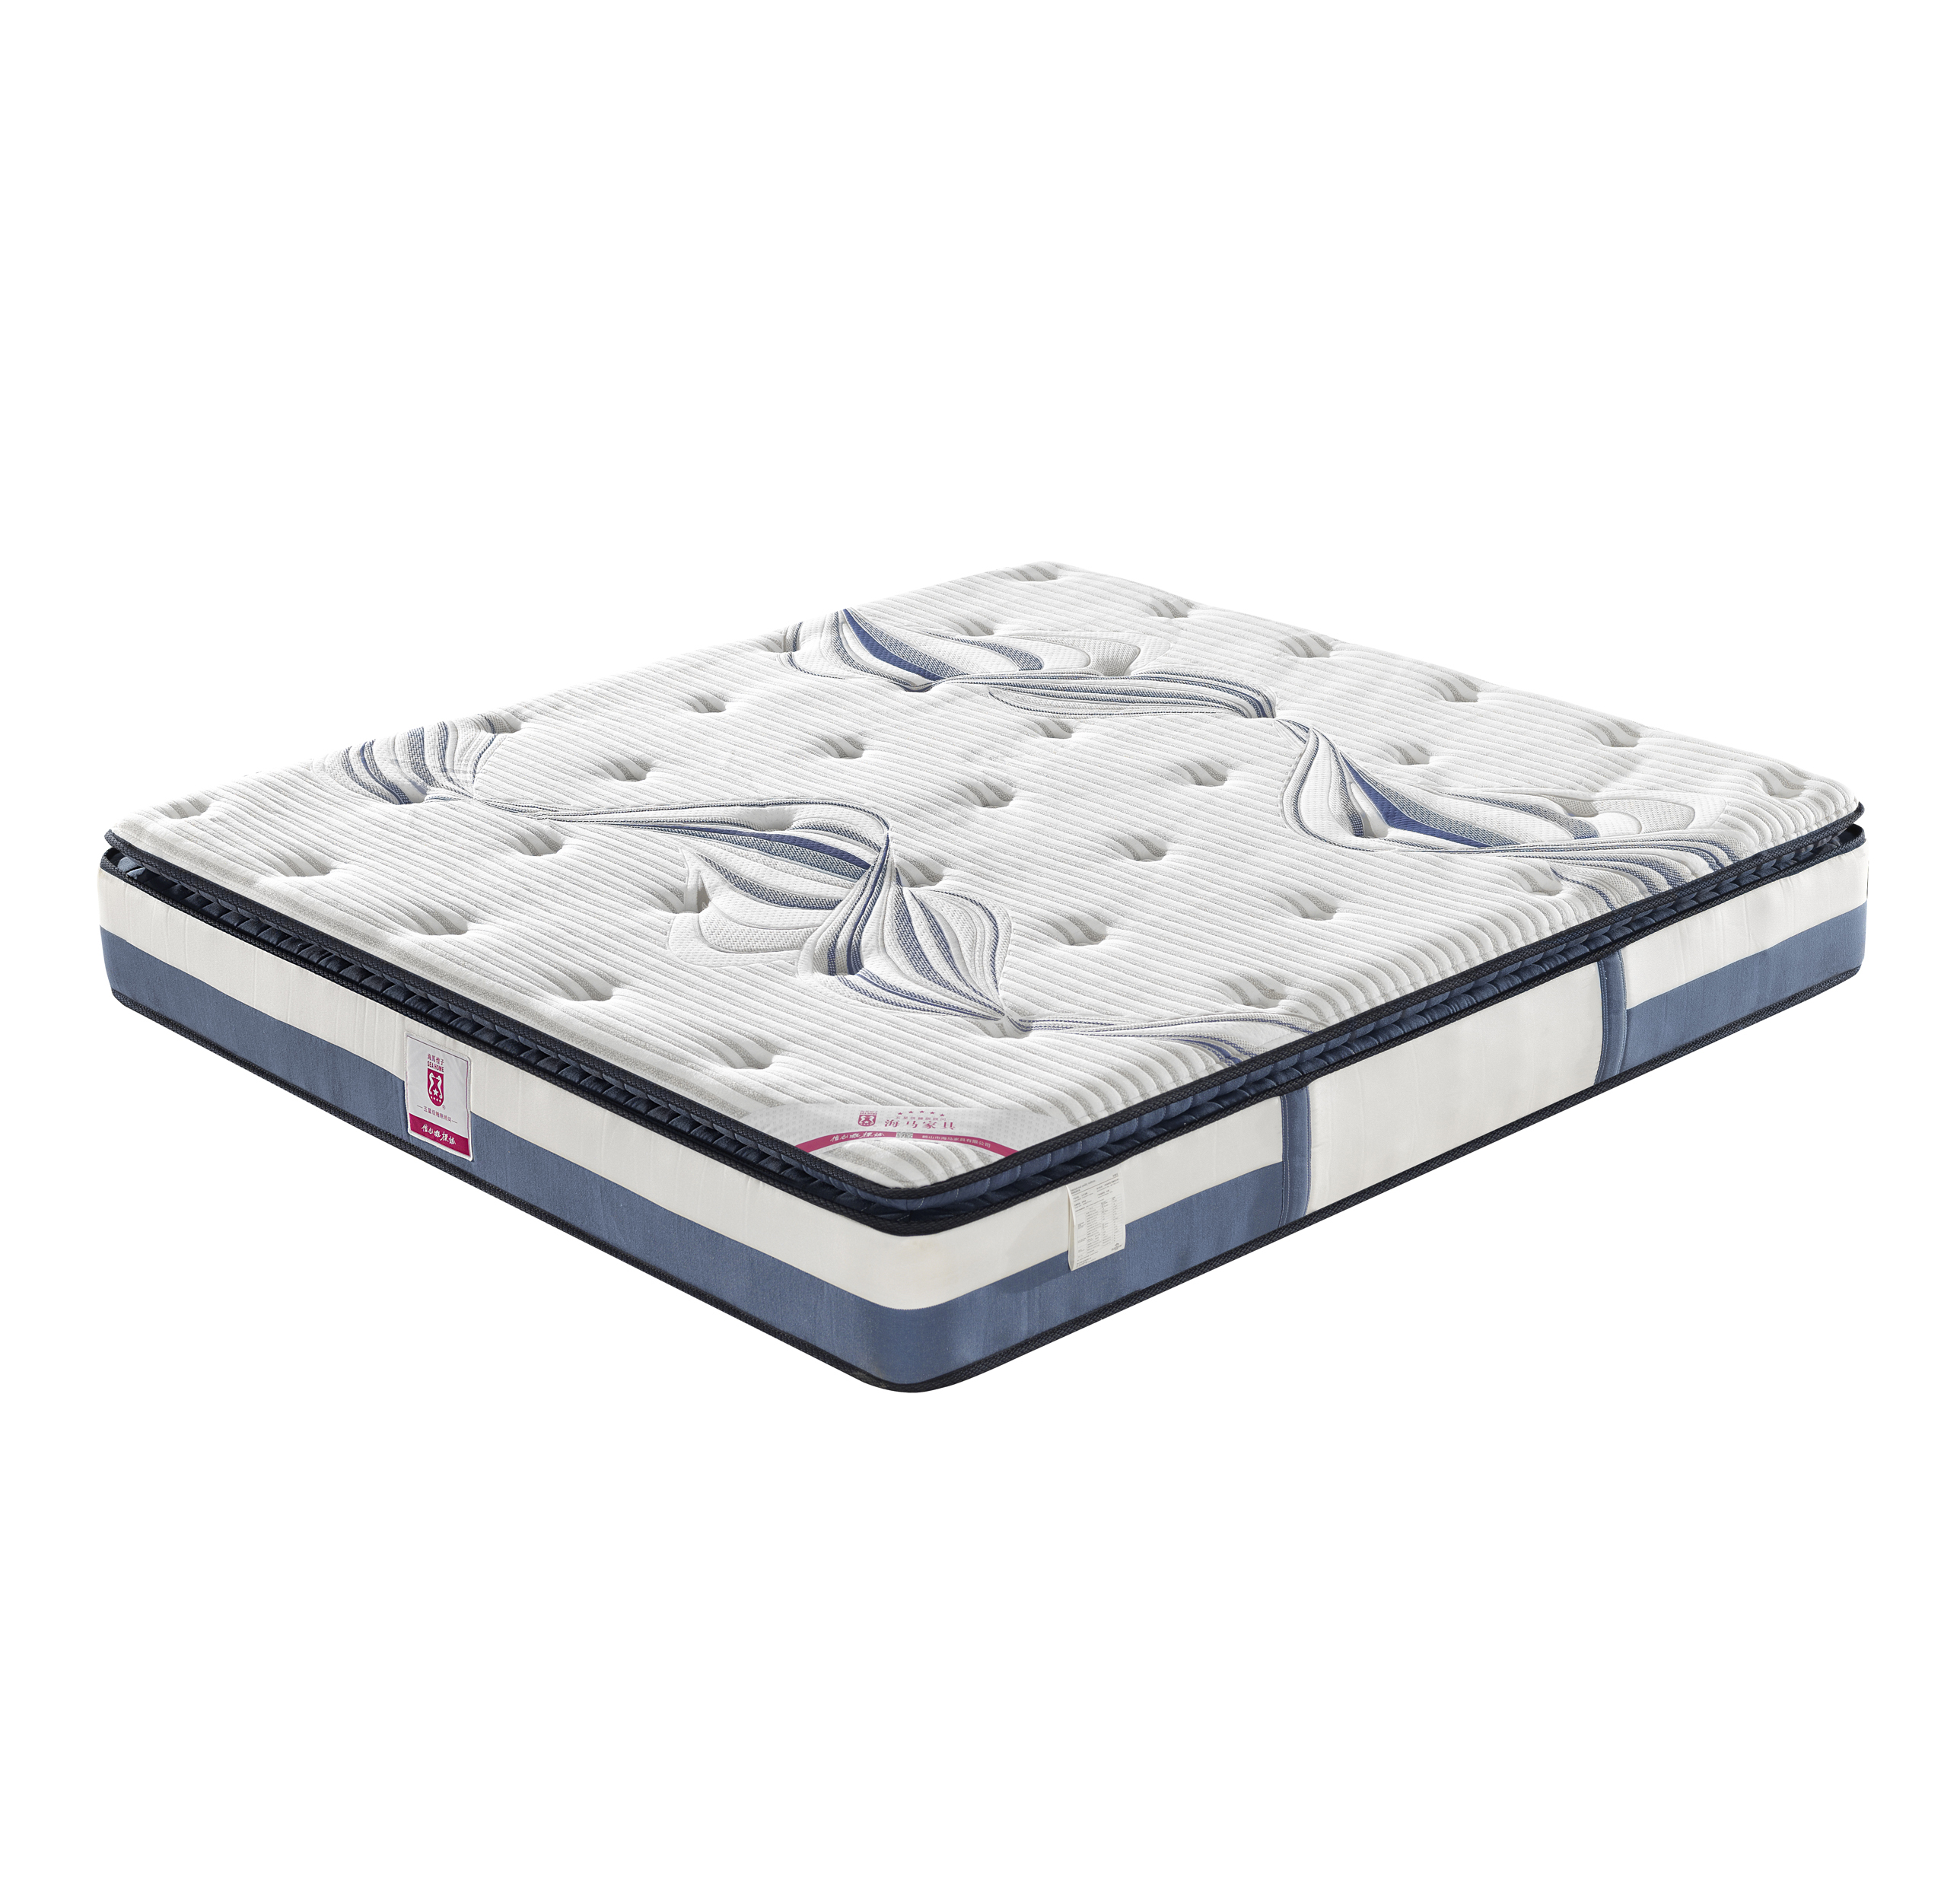 Eliya Aangepaste King Size Katoen Memory Foam 5 Star Hotel Bed Matras Voor Hilton